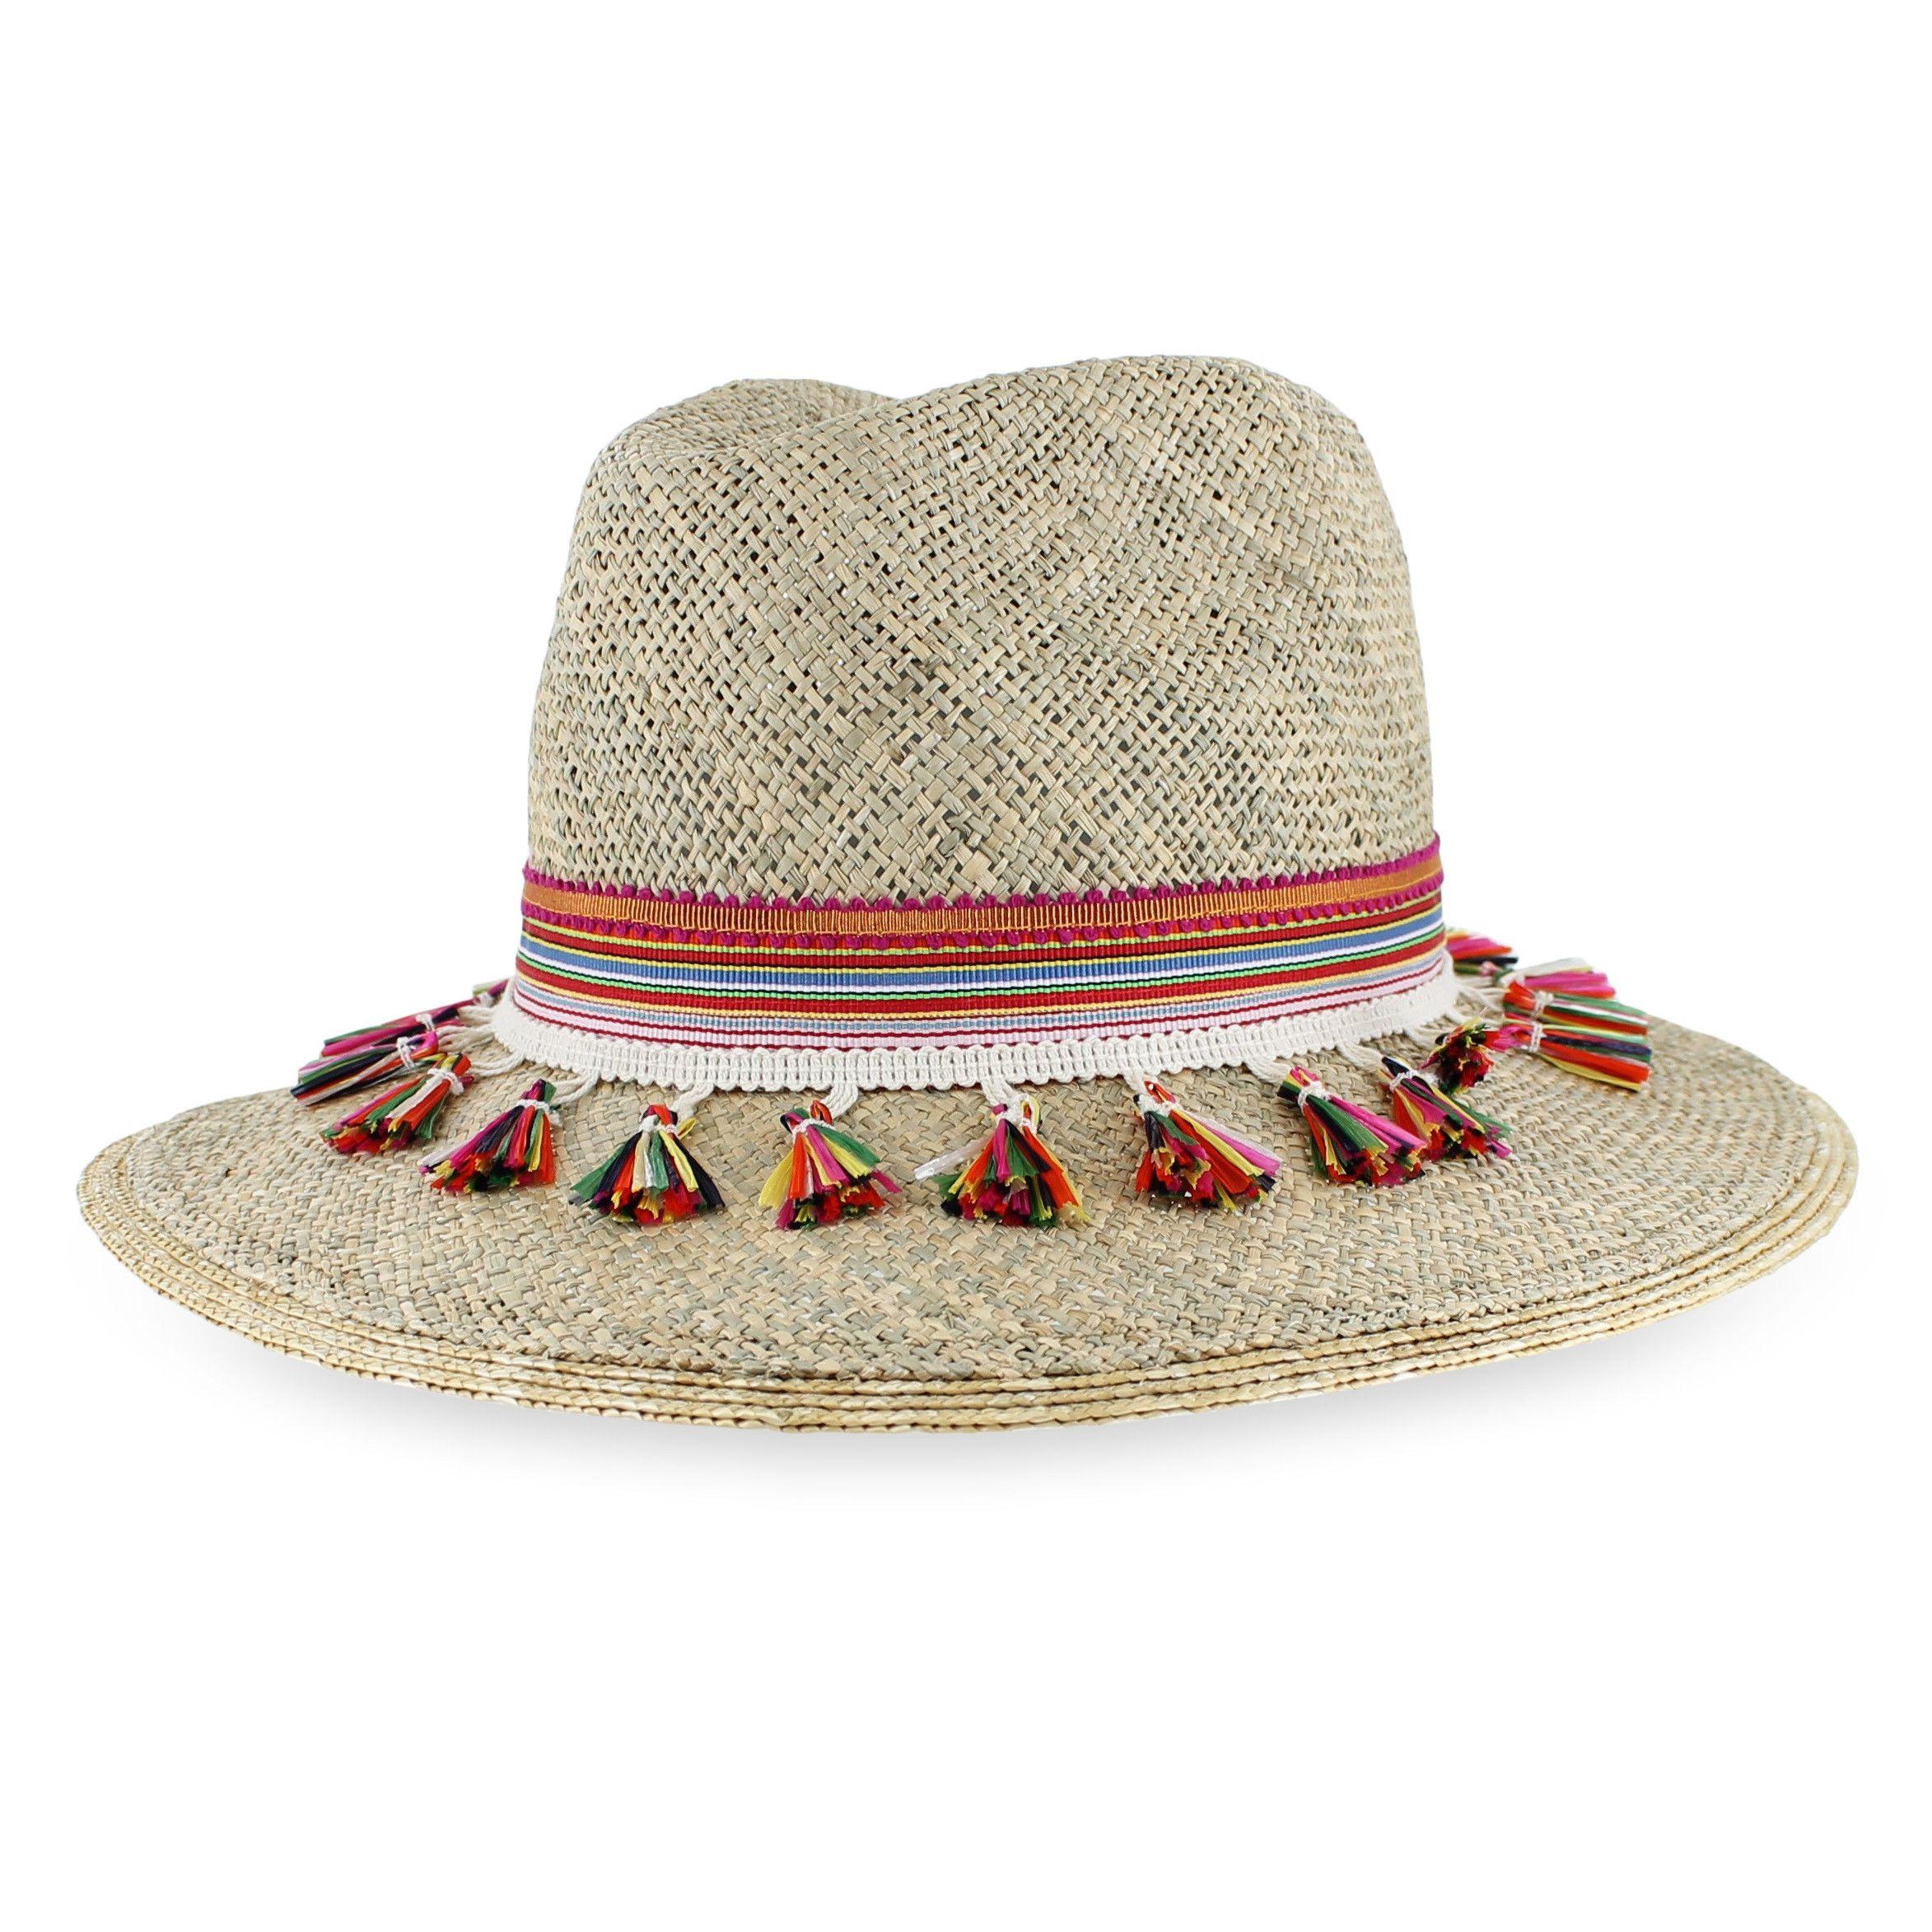 4994079c2ed98a Grevi Tassel Fedora - Seagrass Fedora | fedora painted/sombrero ...